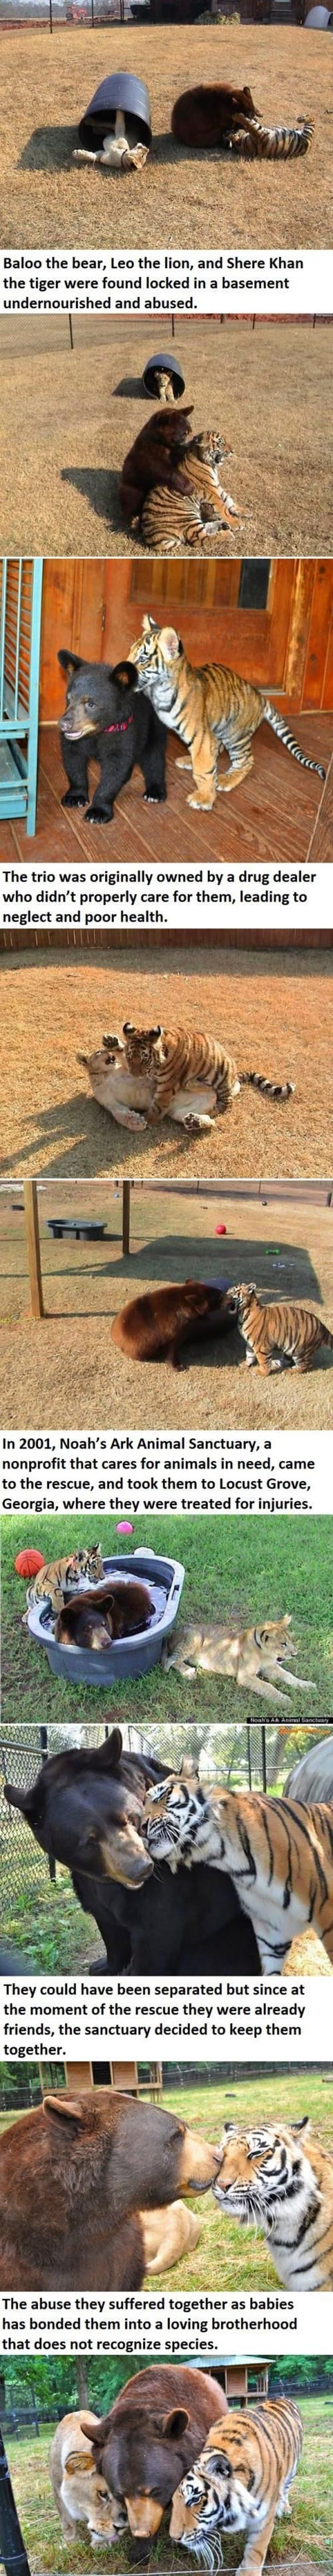 10 Heart Touching Animals Stories 4